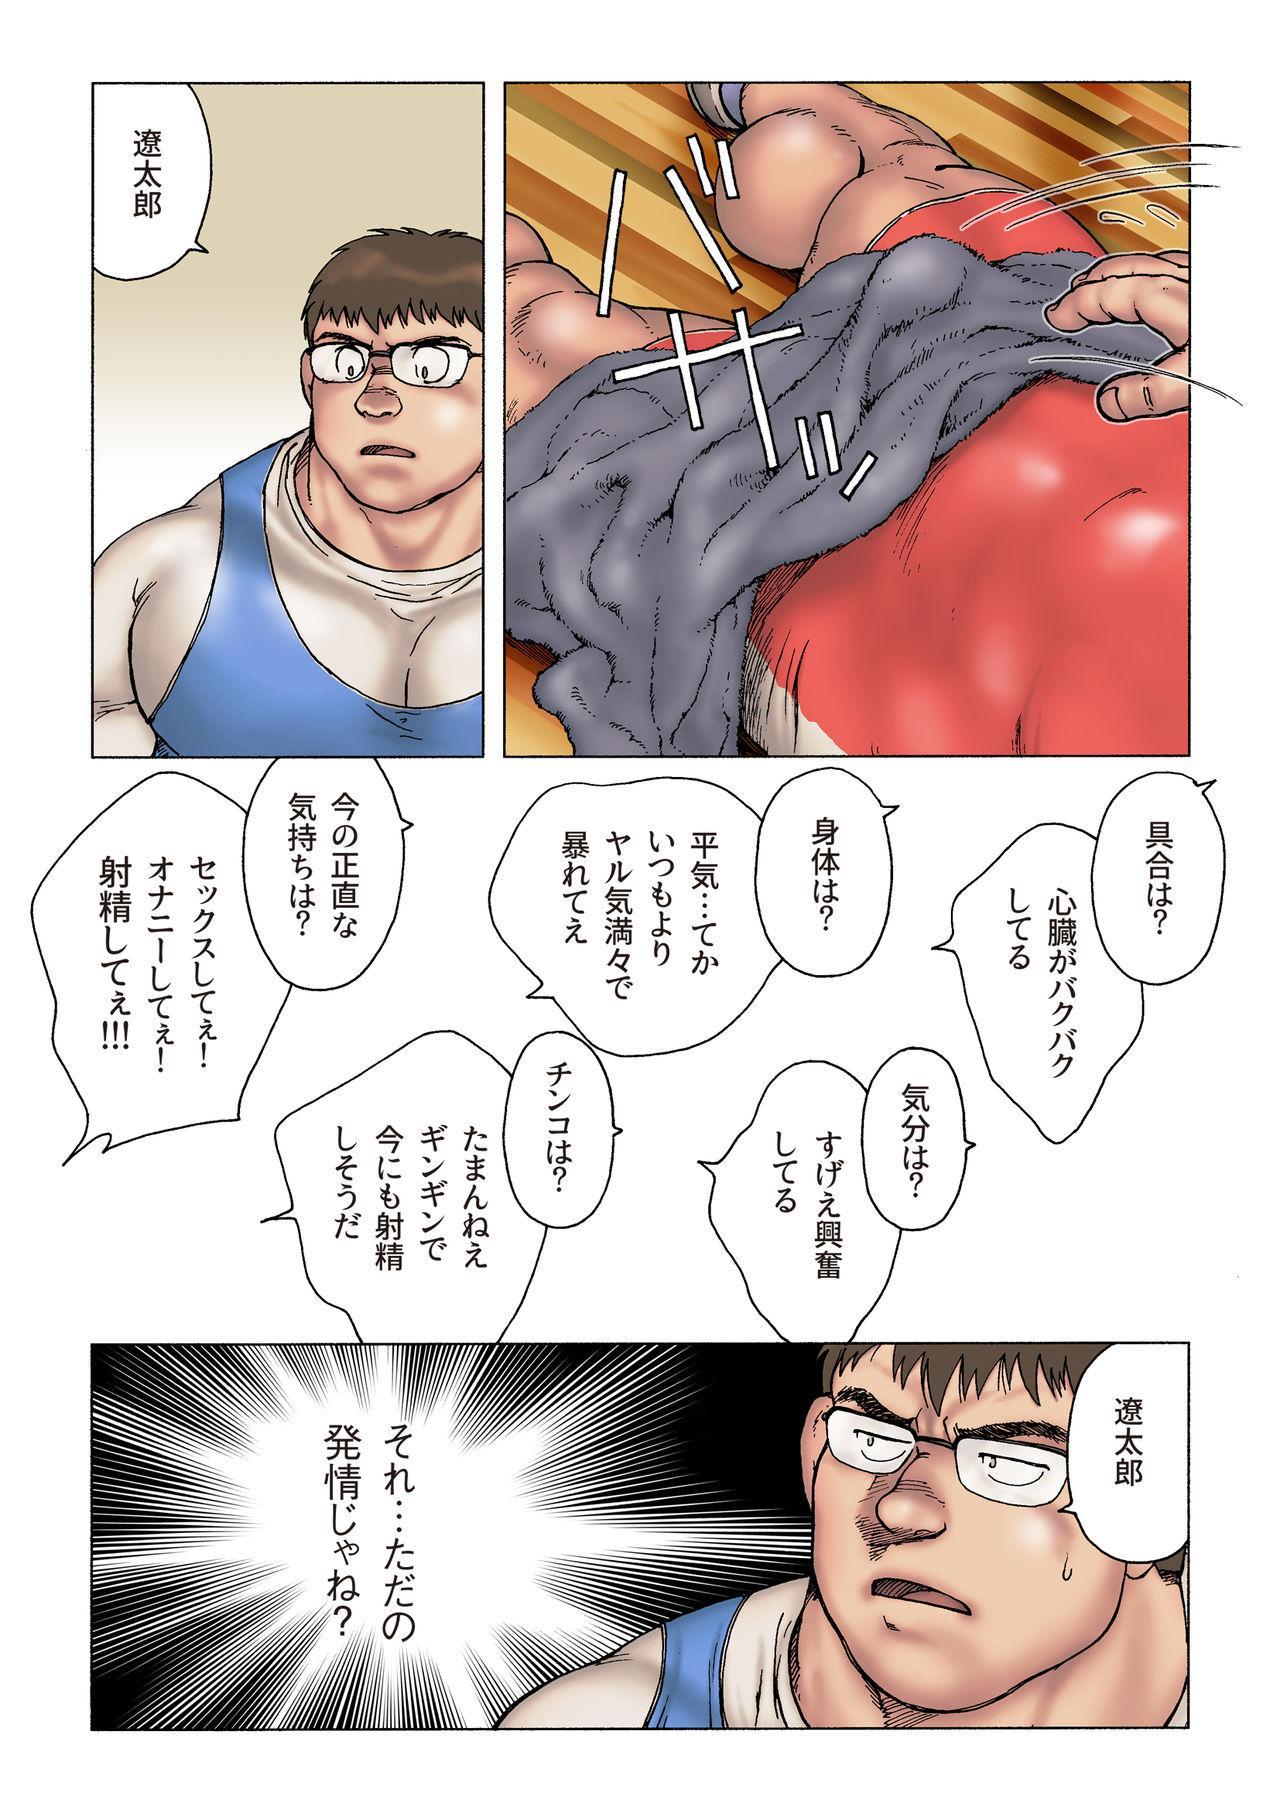 Danshi Koukousei Weightlifter Shiai-chuu, Osae kirenai Wakai Takeri 11